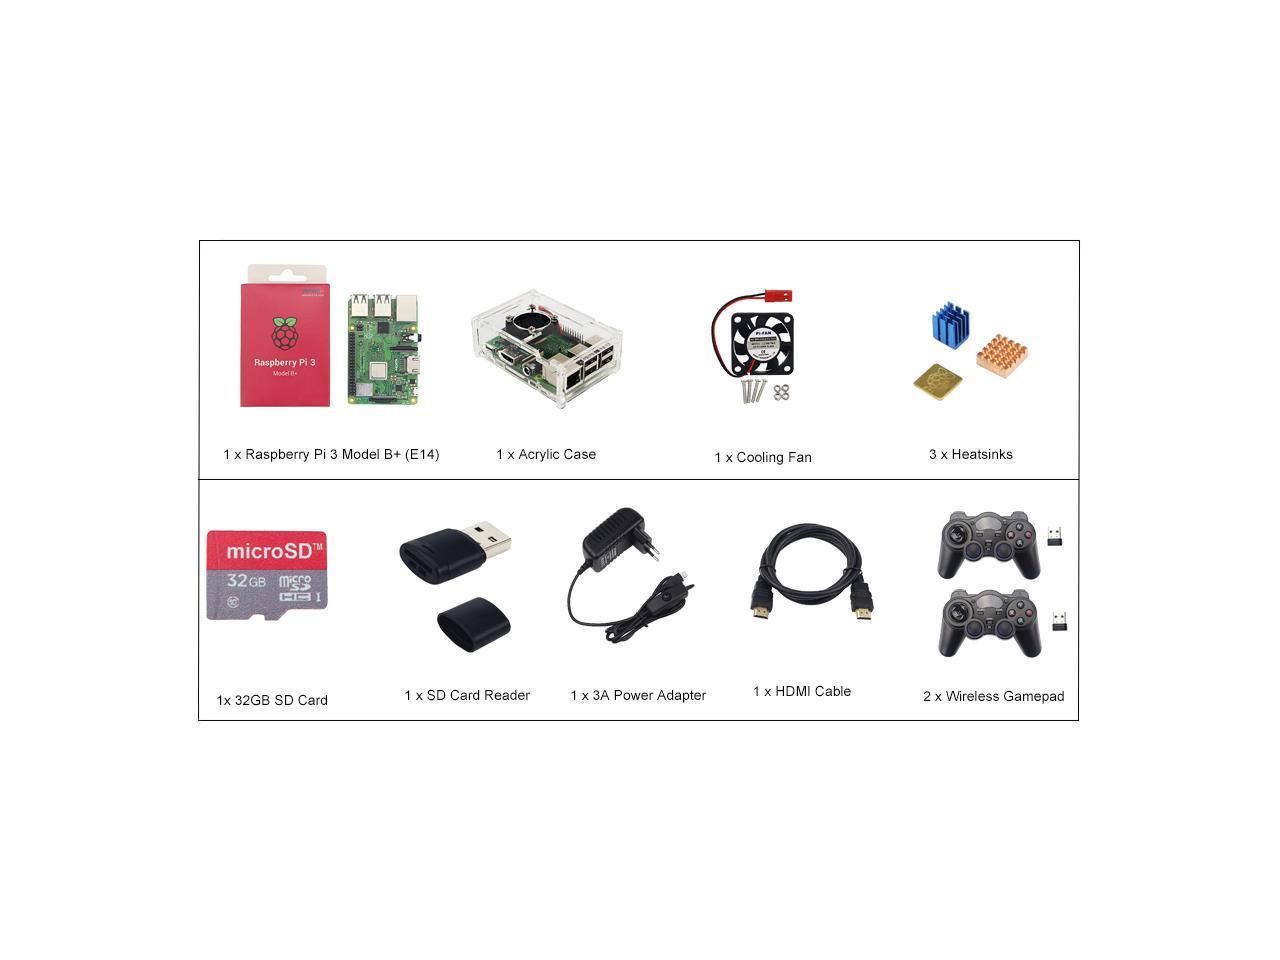 Raspberry Pi 3 Model B Plus Game Kit Wireless Gamepads